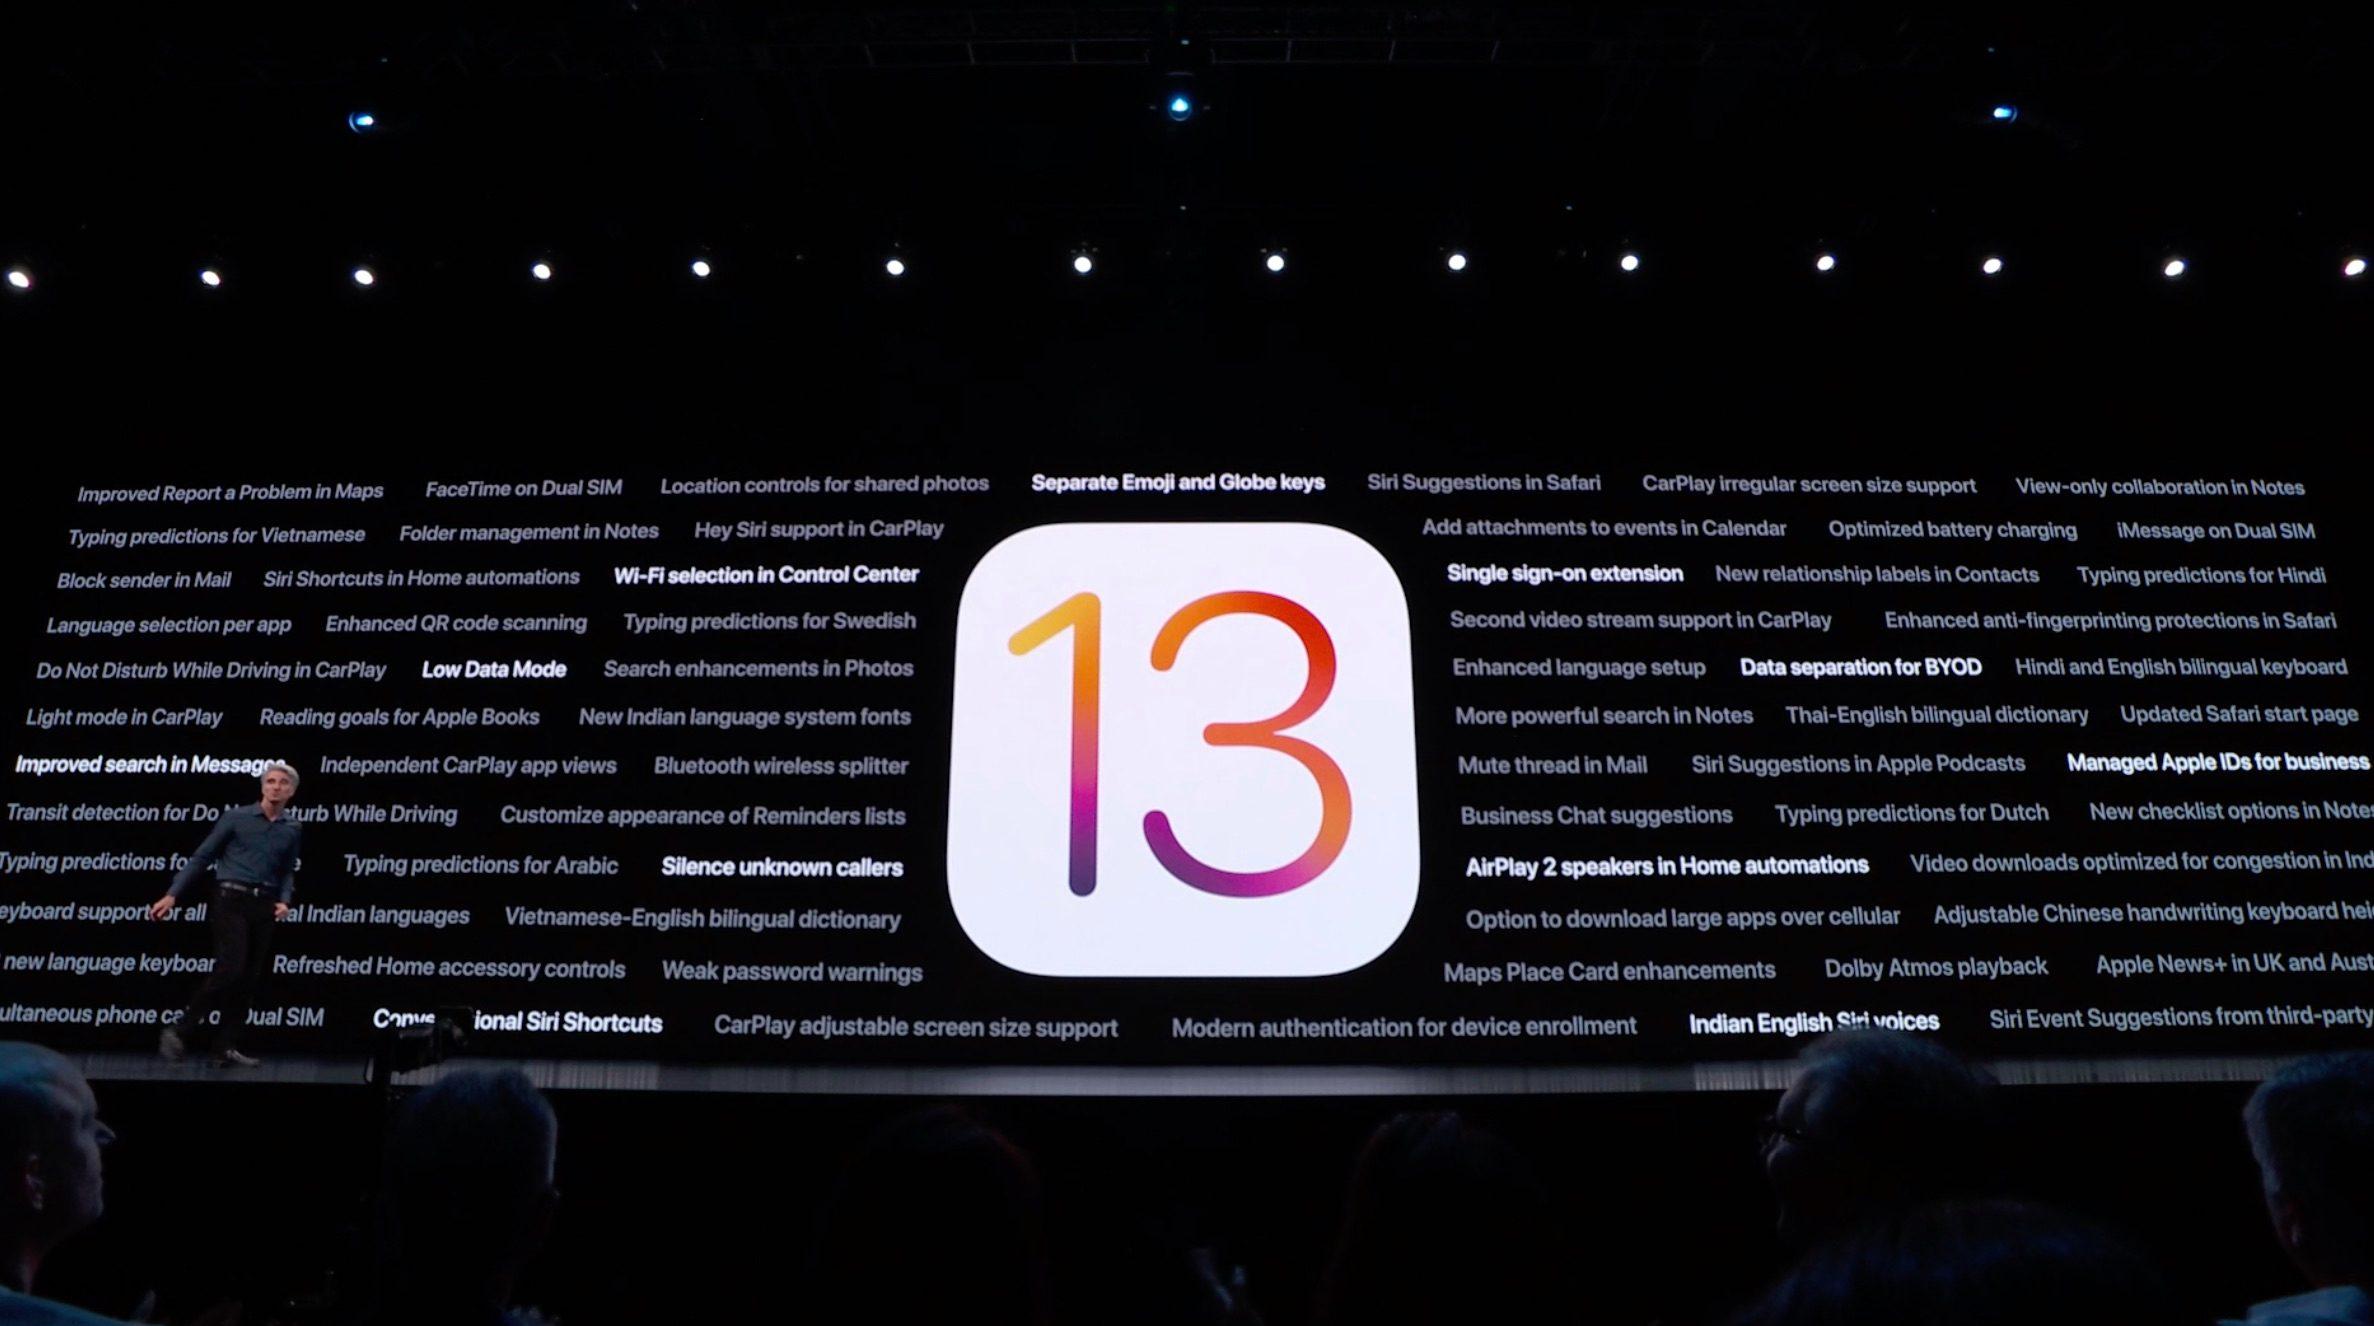 33087435d مميزات جديدة ومثيرة في iOS 13 - آي-فون إسلام